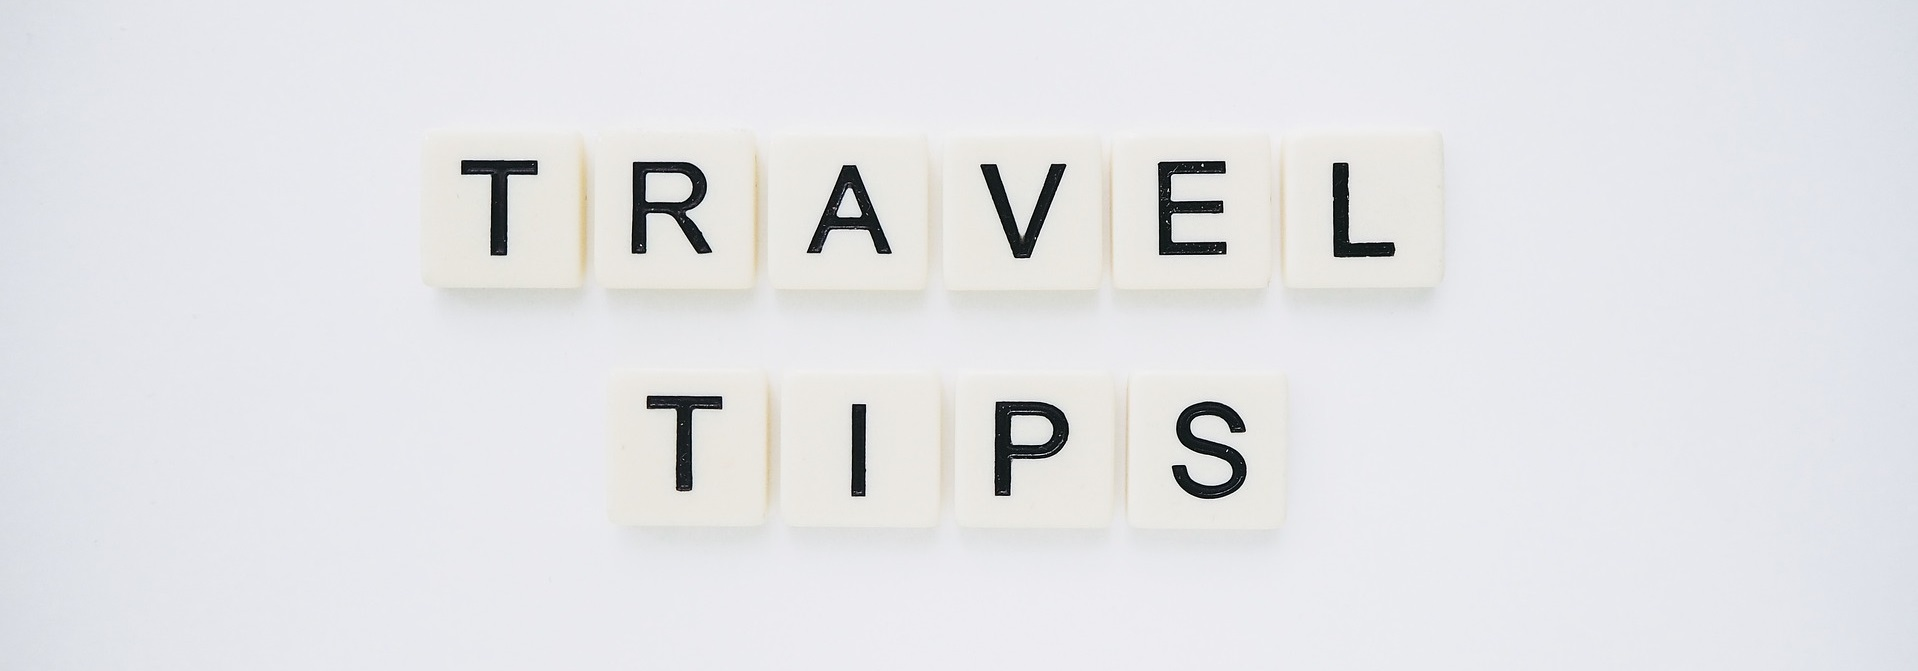 431 425 travel tips 4232587 1920